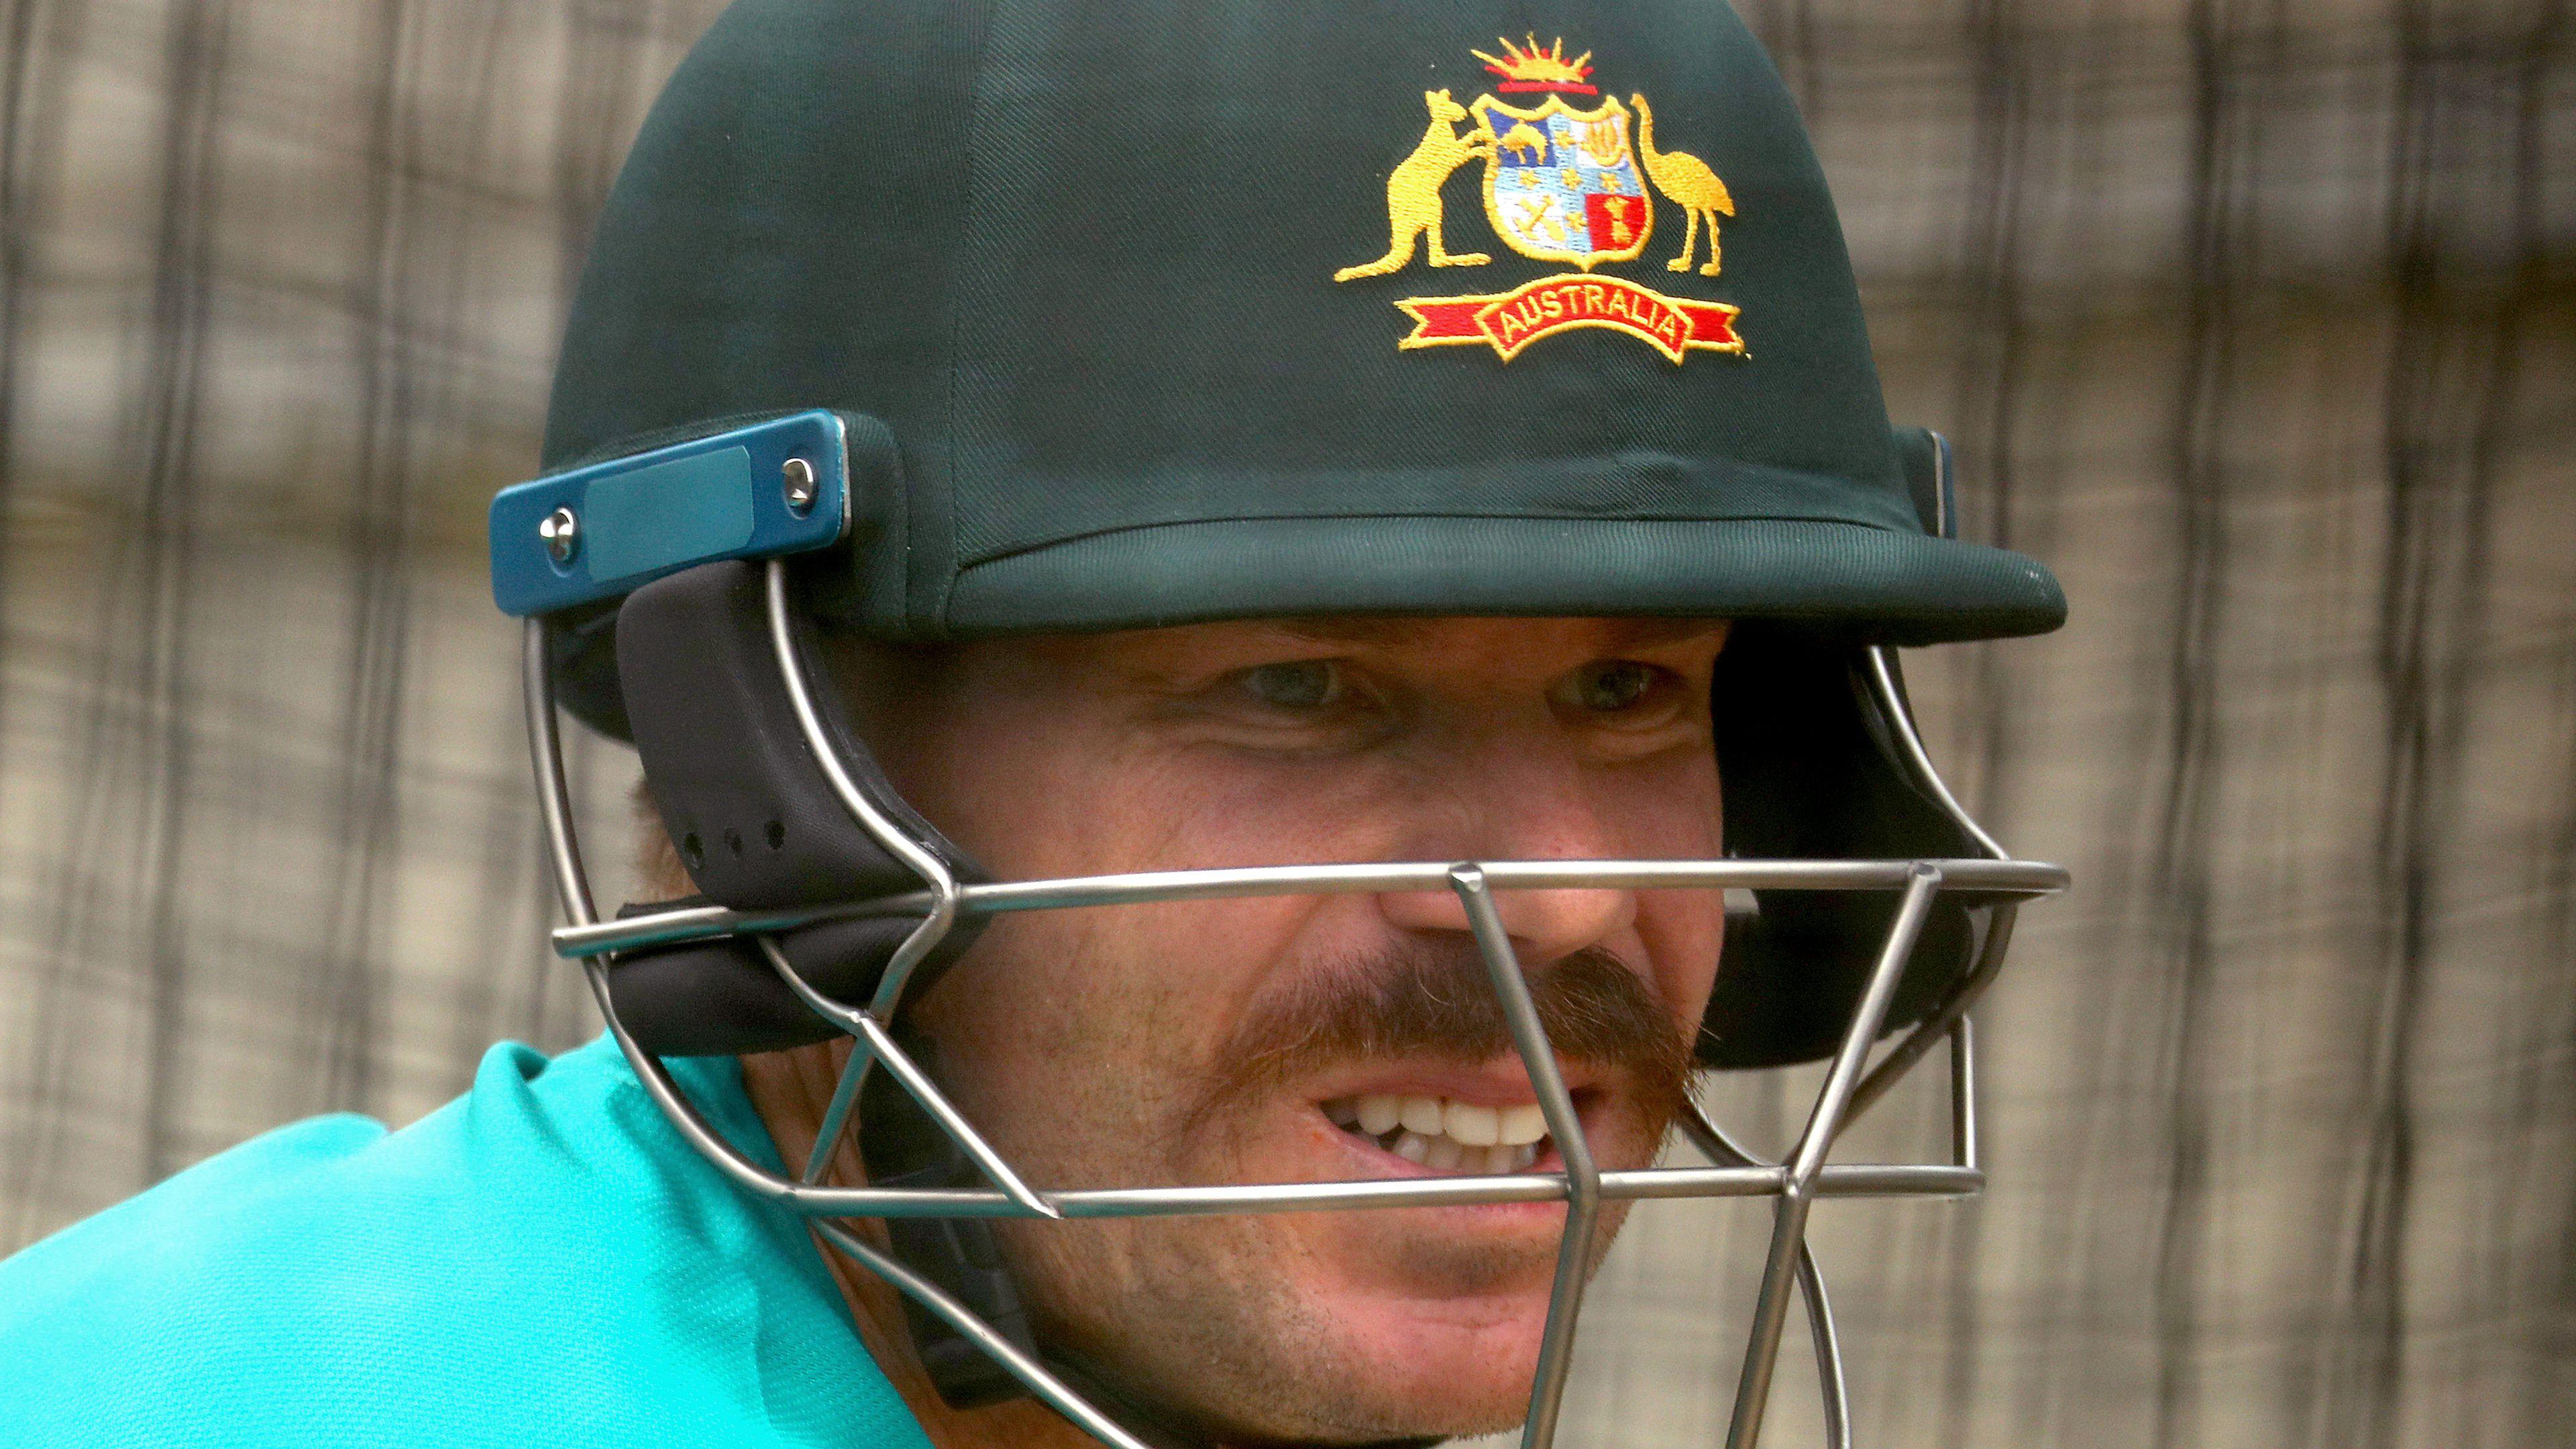 Australia expects David Warner to play in SCG Test, according to opening batsman Matthew Wade